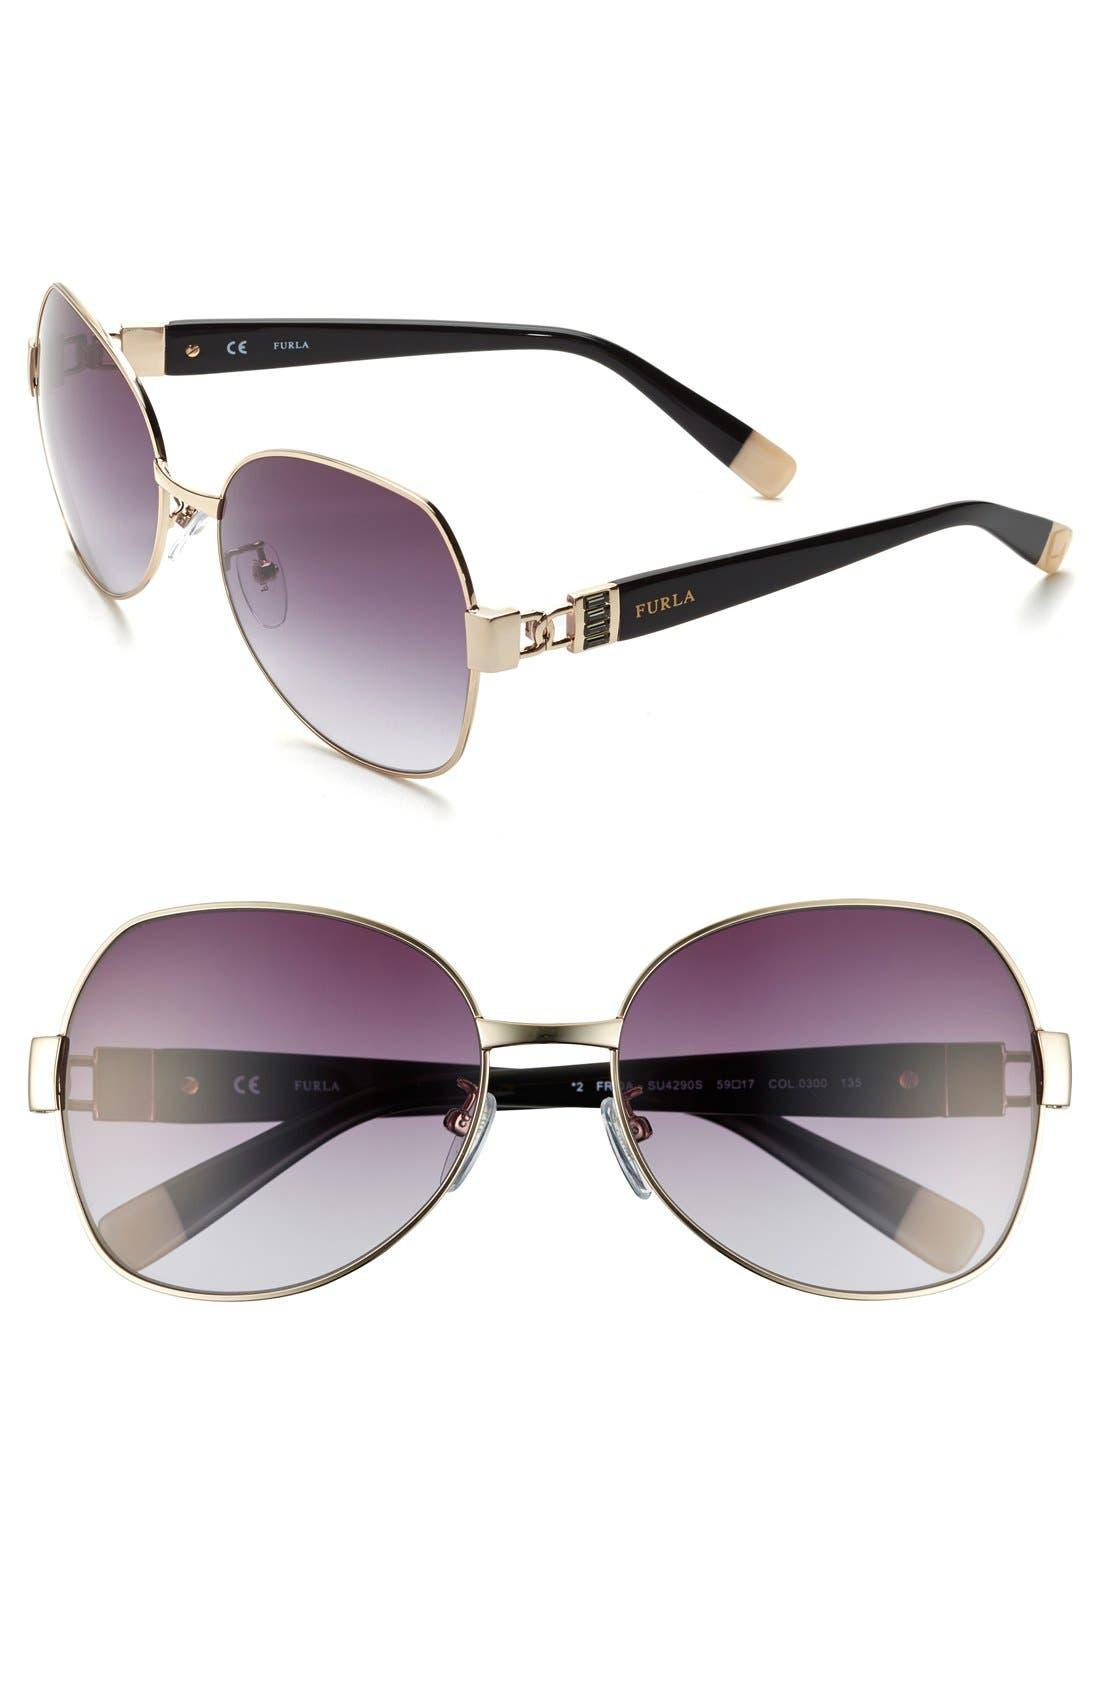 Alternate Image 1 Selected - Furla 59mm Swarovski Crystal Sunglasses